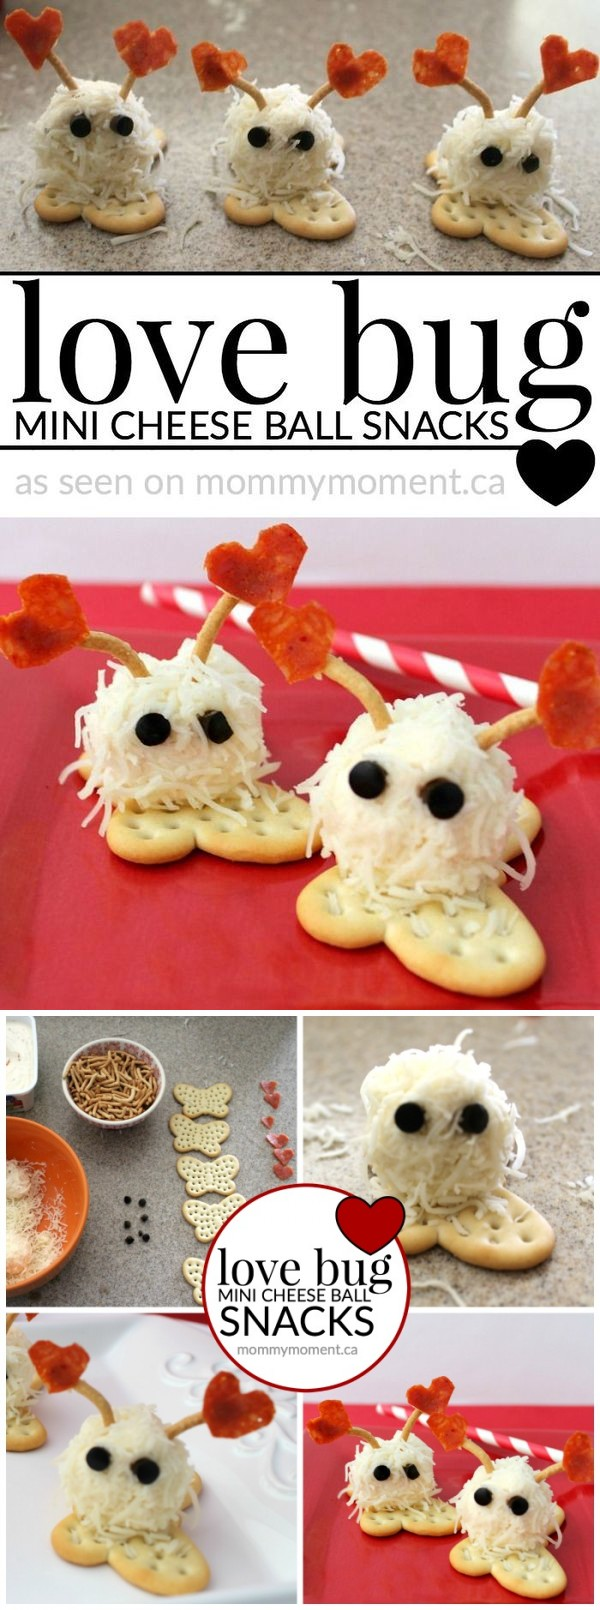 Love bug mini cheese balls snack